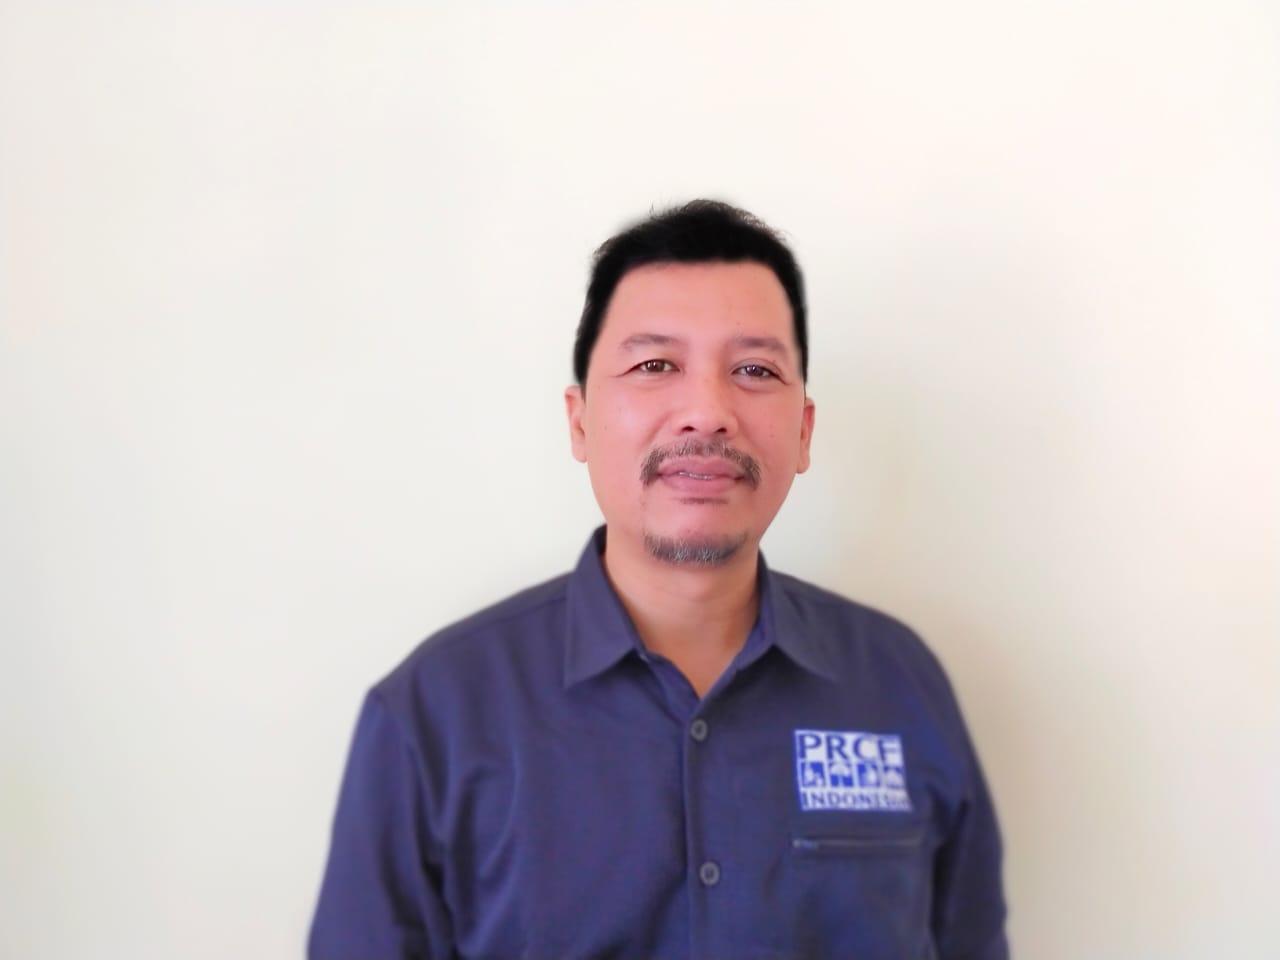 PRCF Dampingi Lima Desa dalam Program Rimba Collecitive